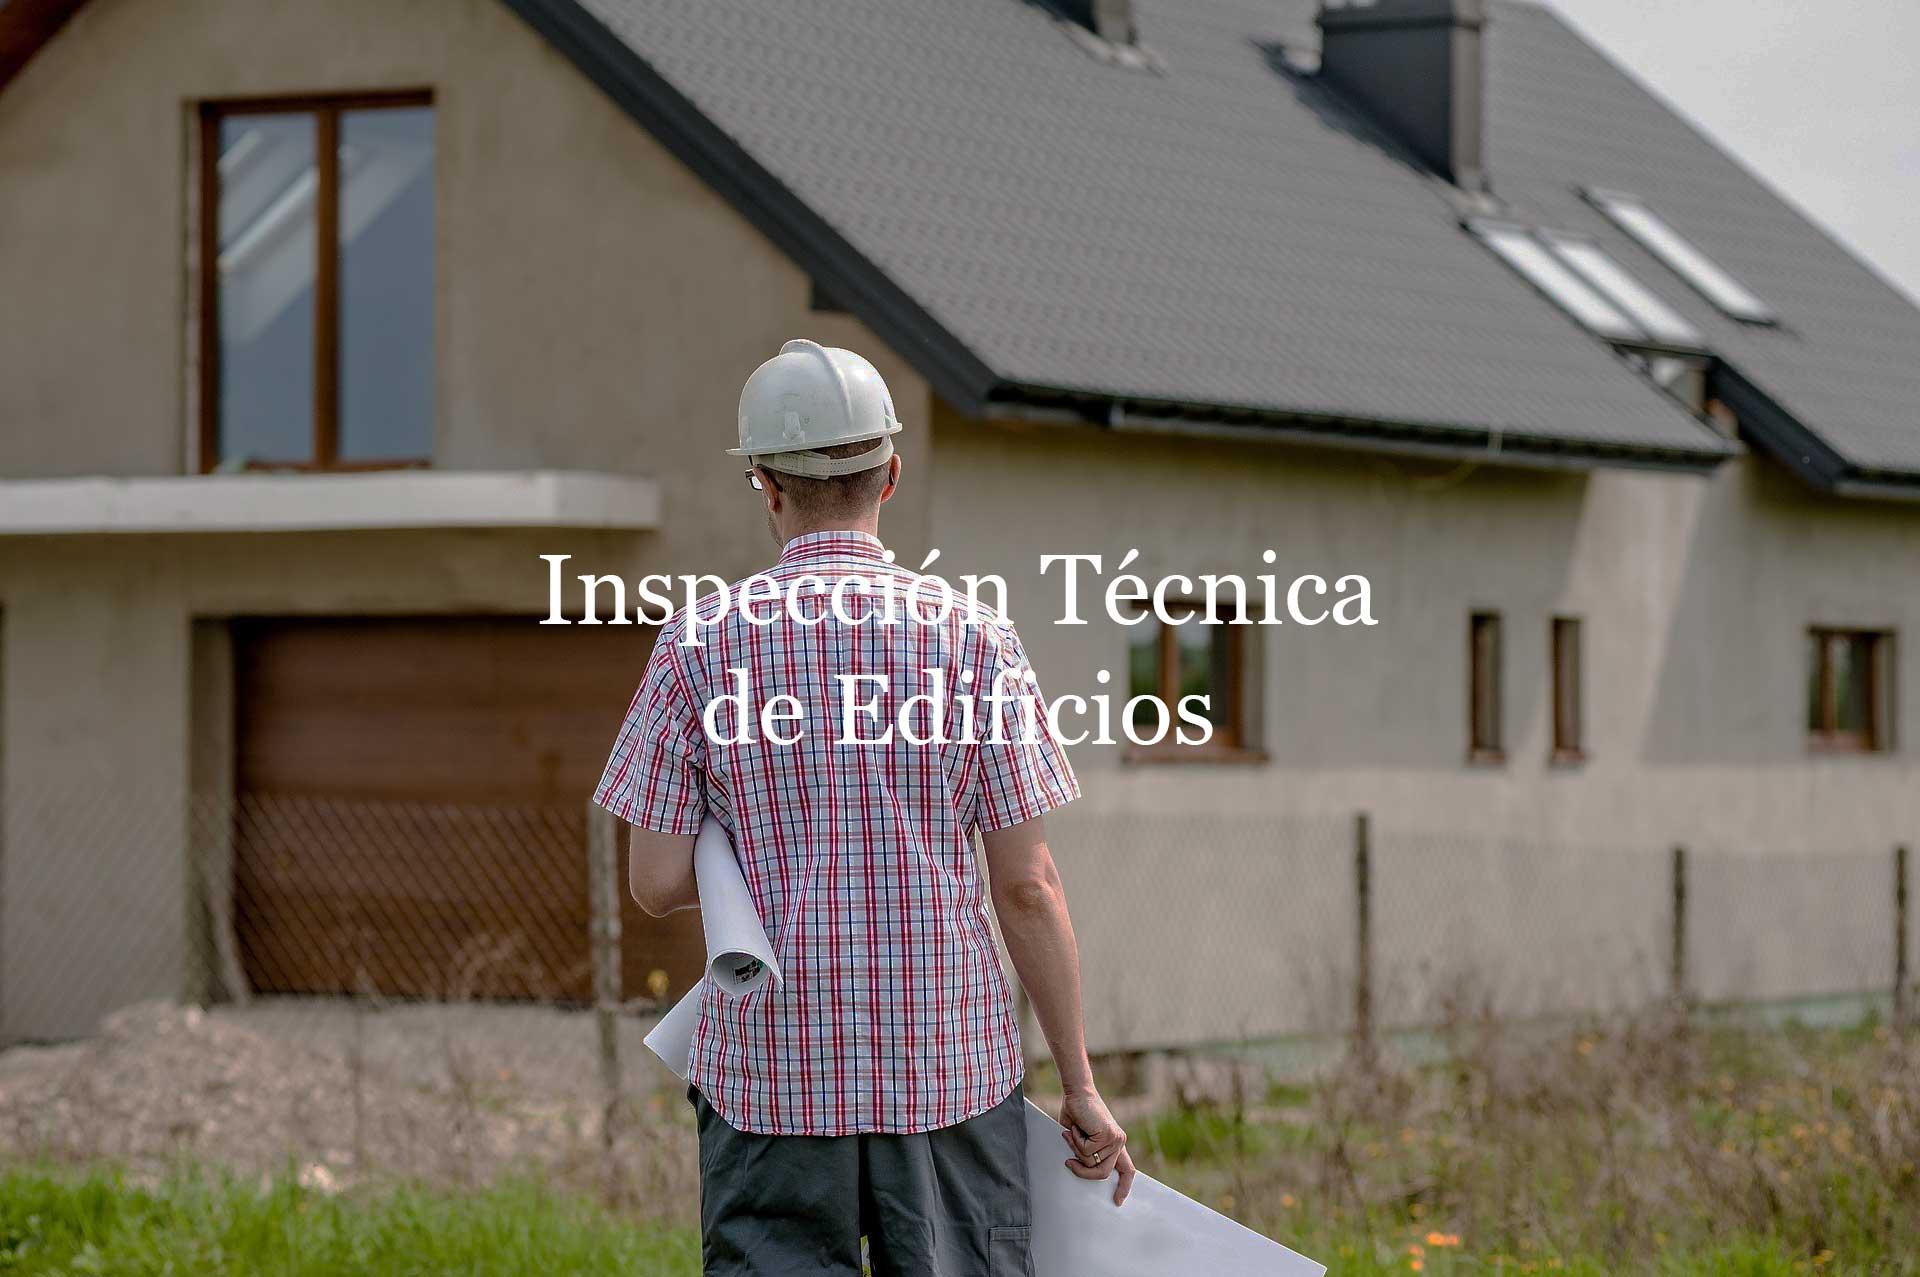 tarifas-inspeccion-tecnica-edificios